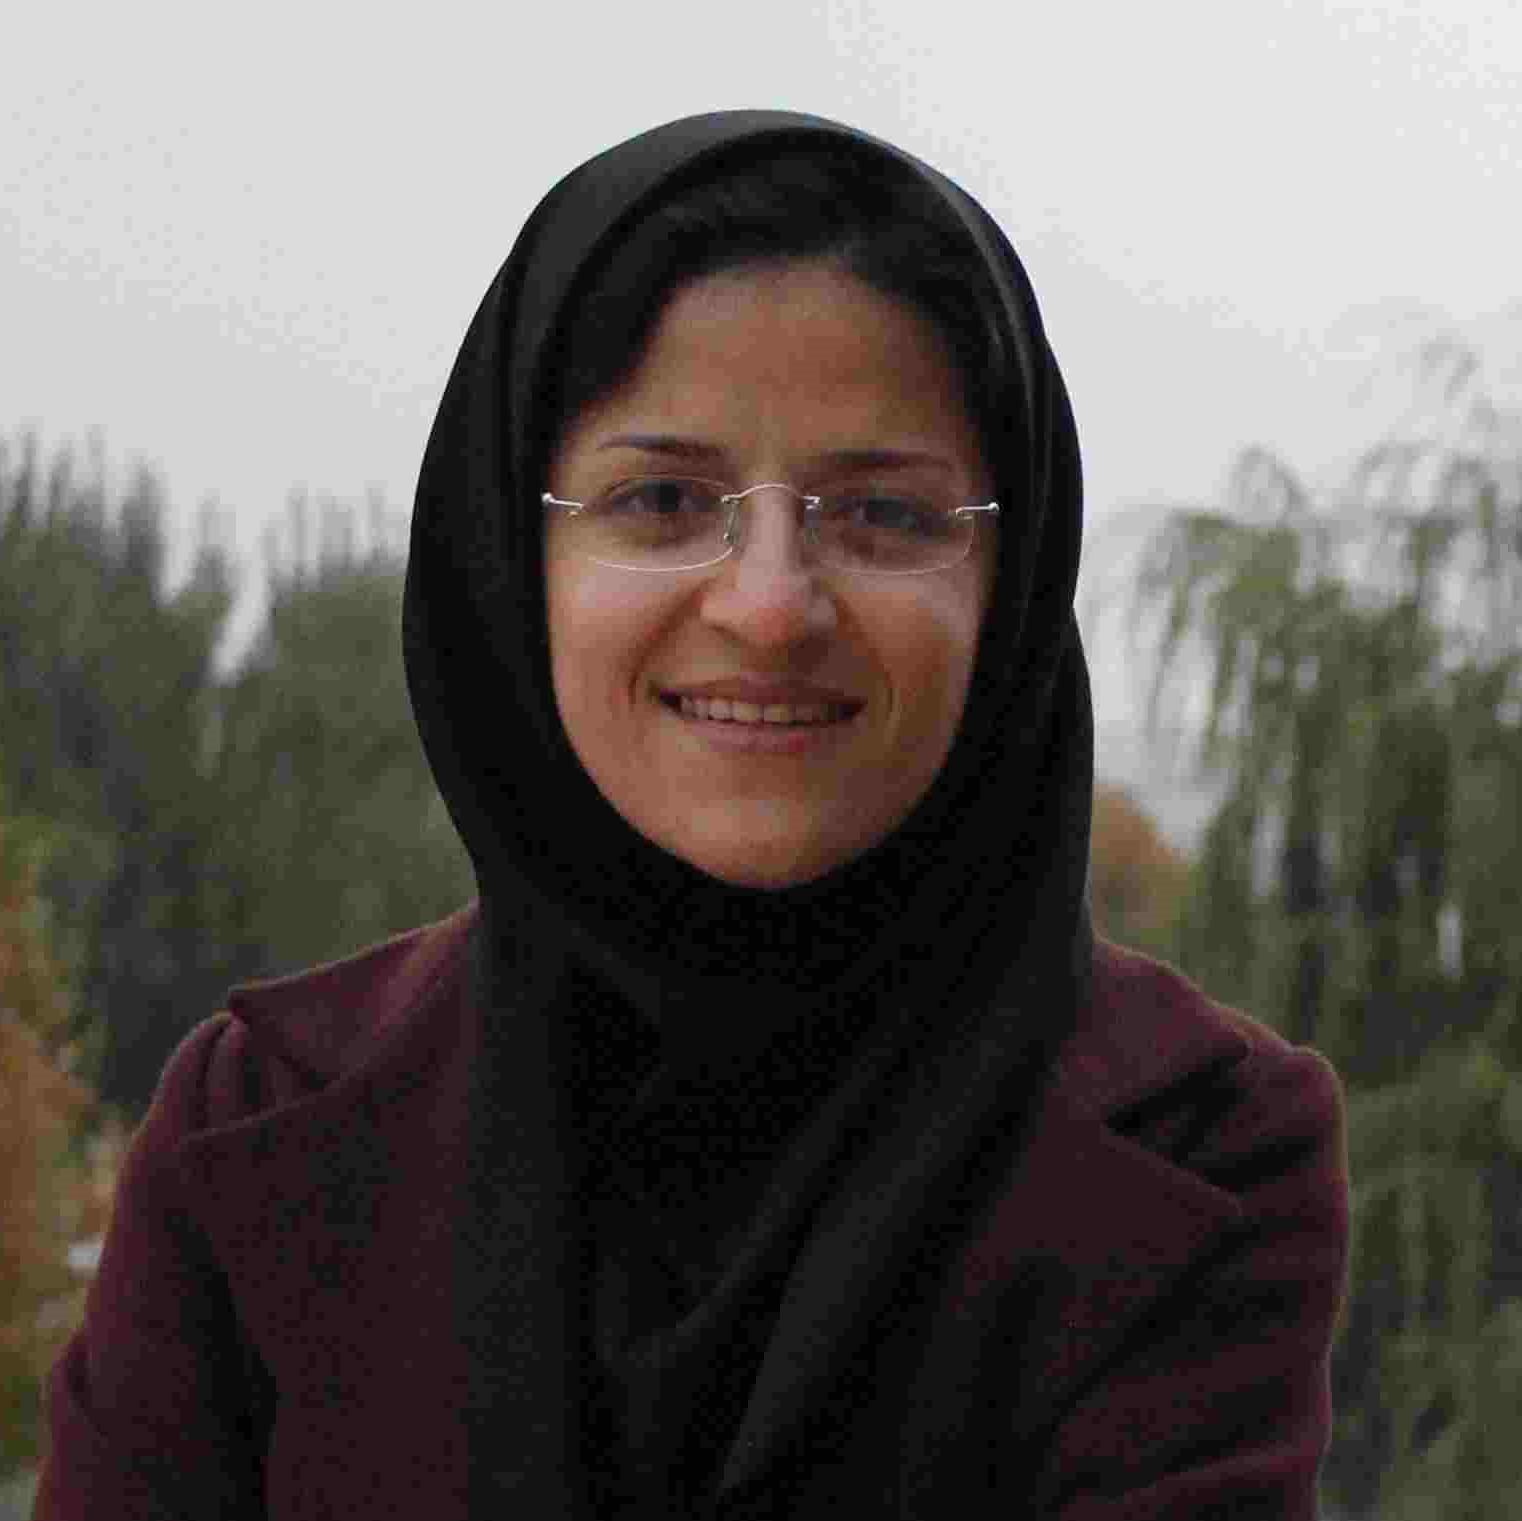 Sarah Mohammadi Nejad